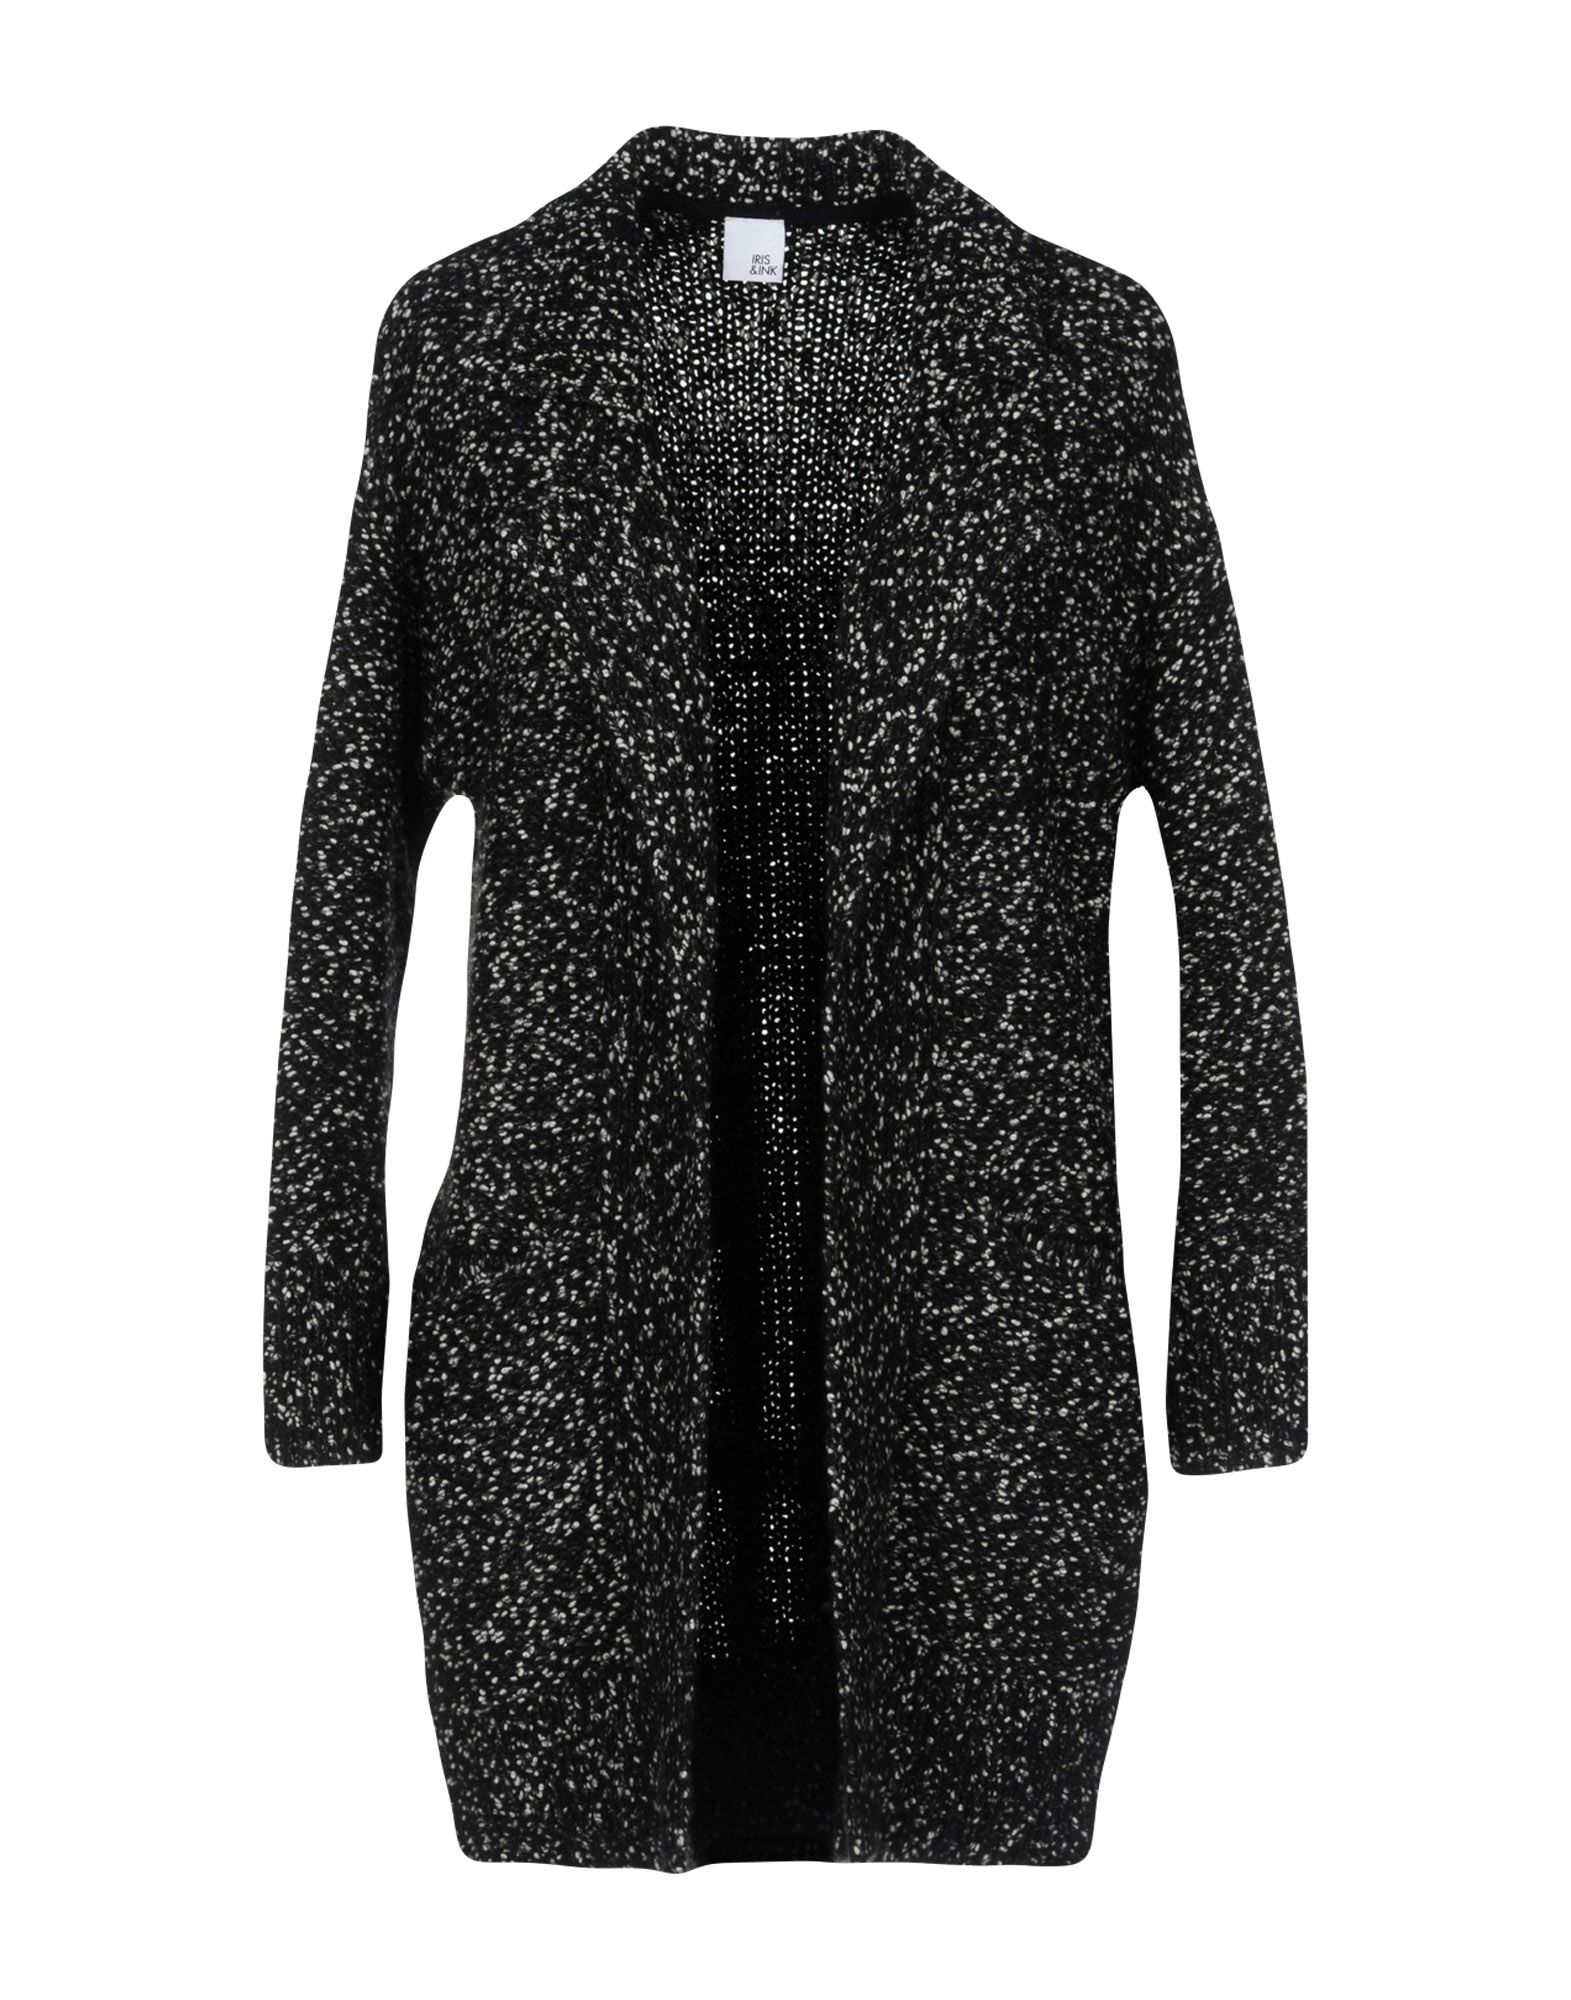 IRIS & INK Coat in Black